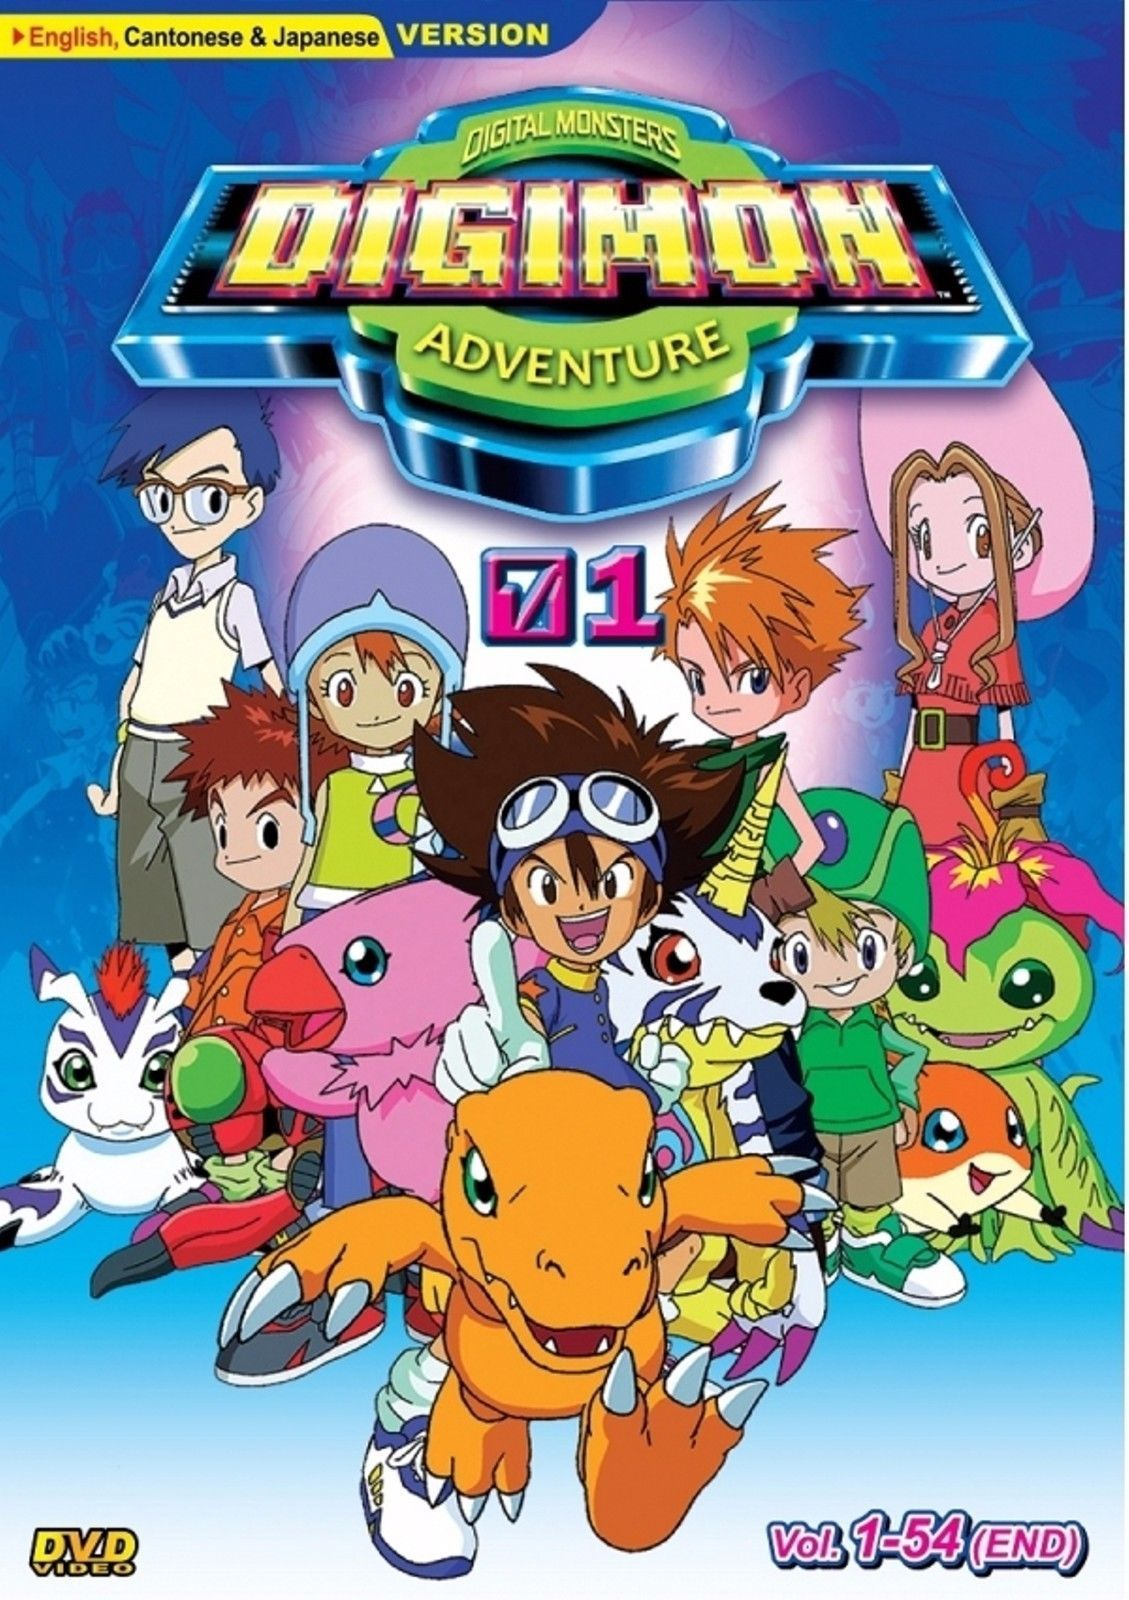 Anime Dvd Digimon Adventure 01 Vol 1 54 End Japan Animation Box Set